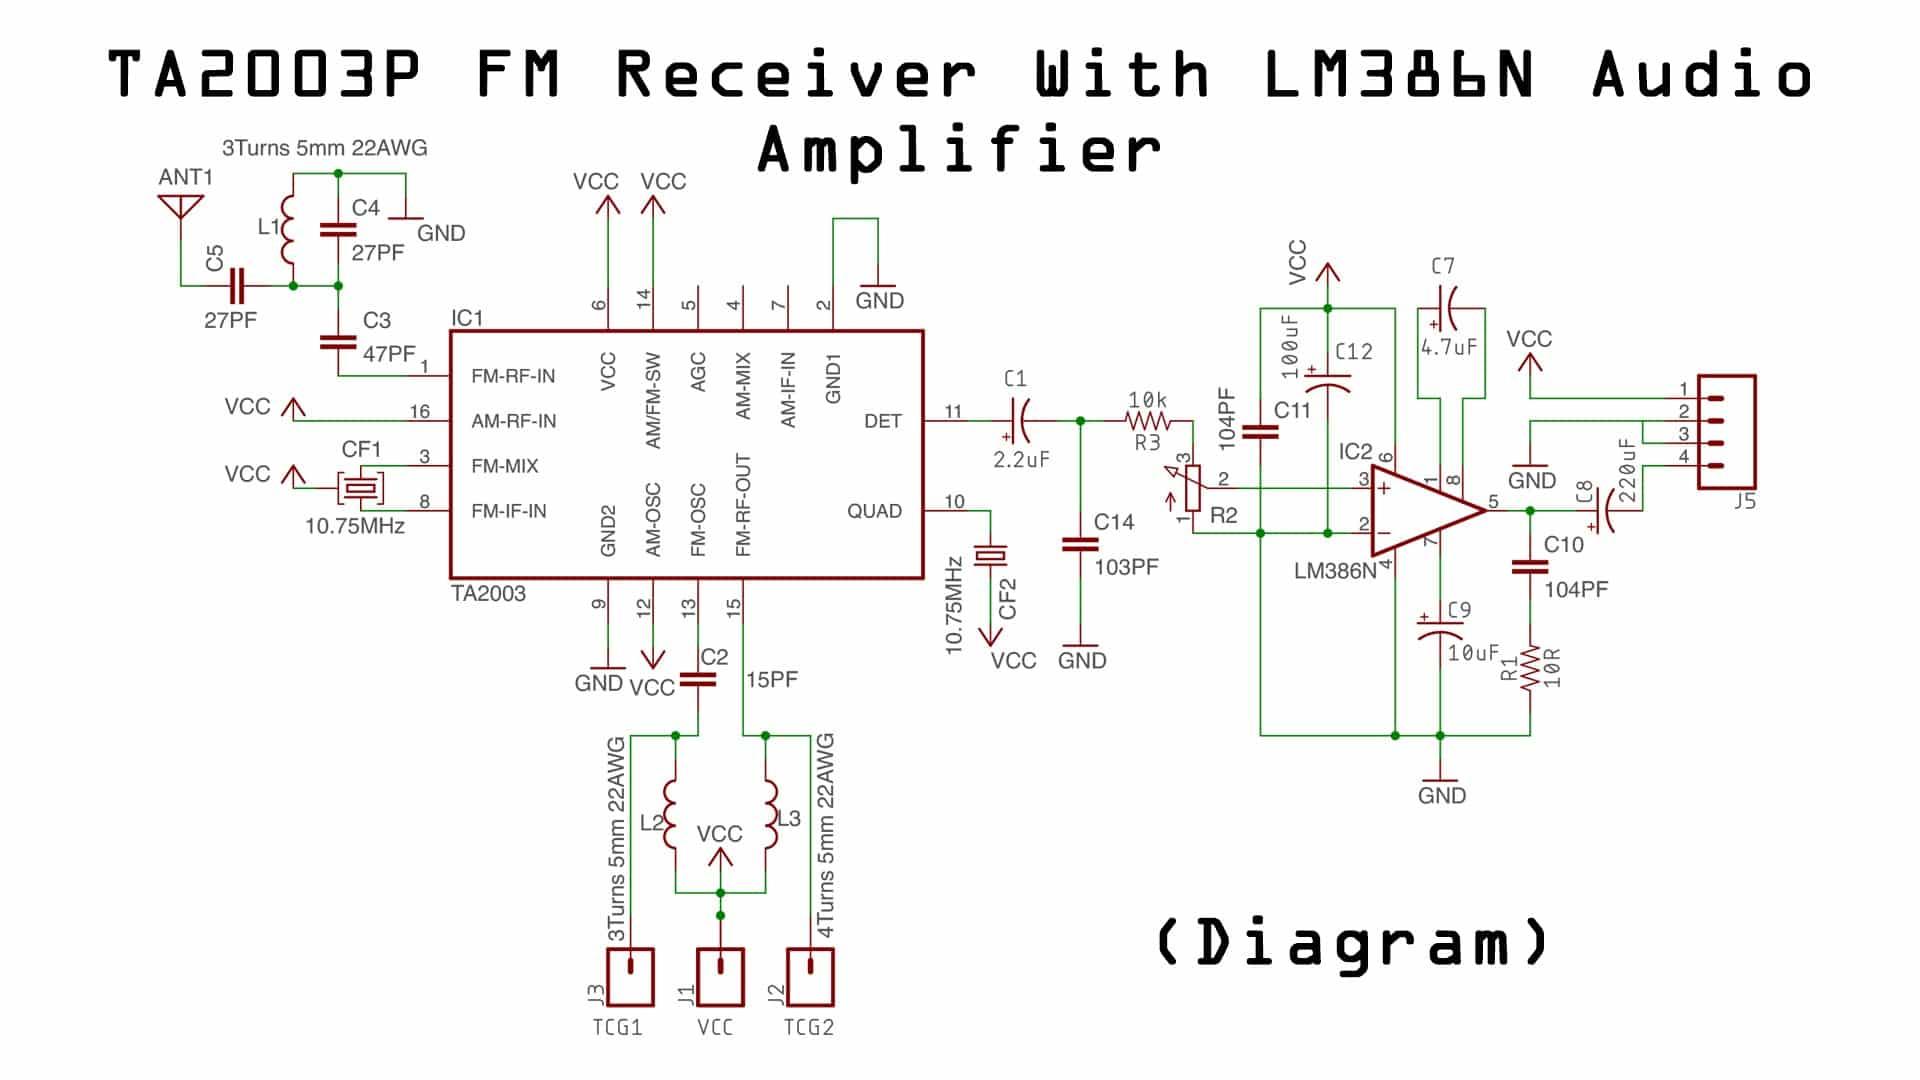 TA2003P FM Receiver (Diagram) - Electronics Projects Hub